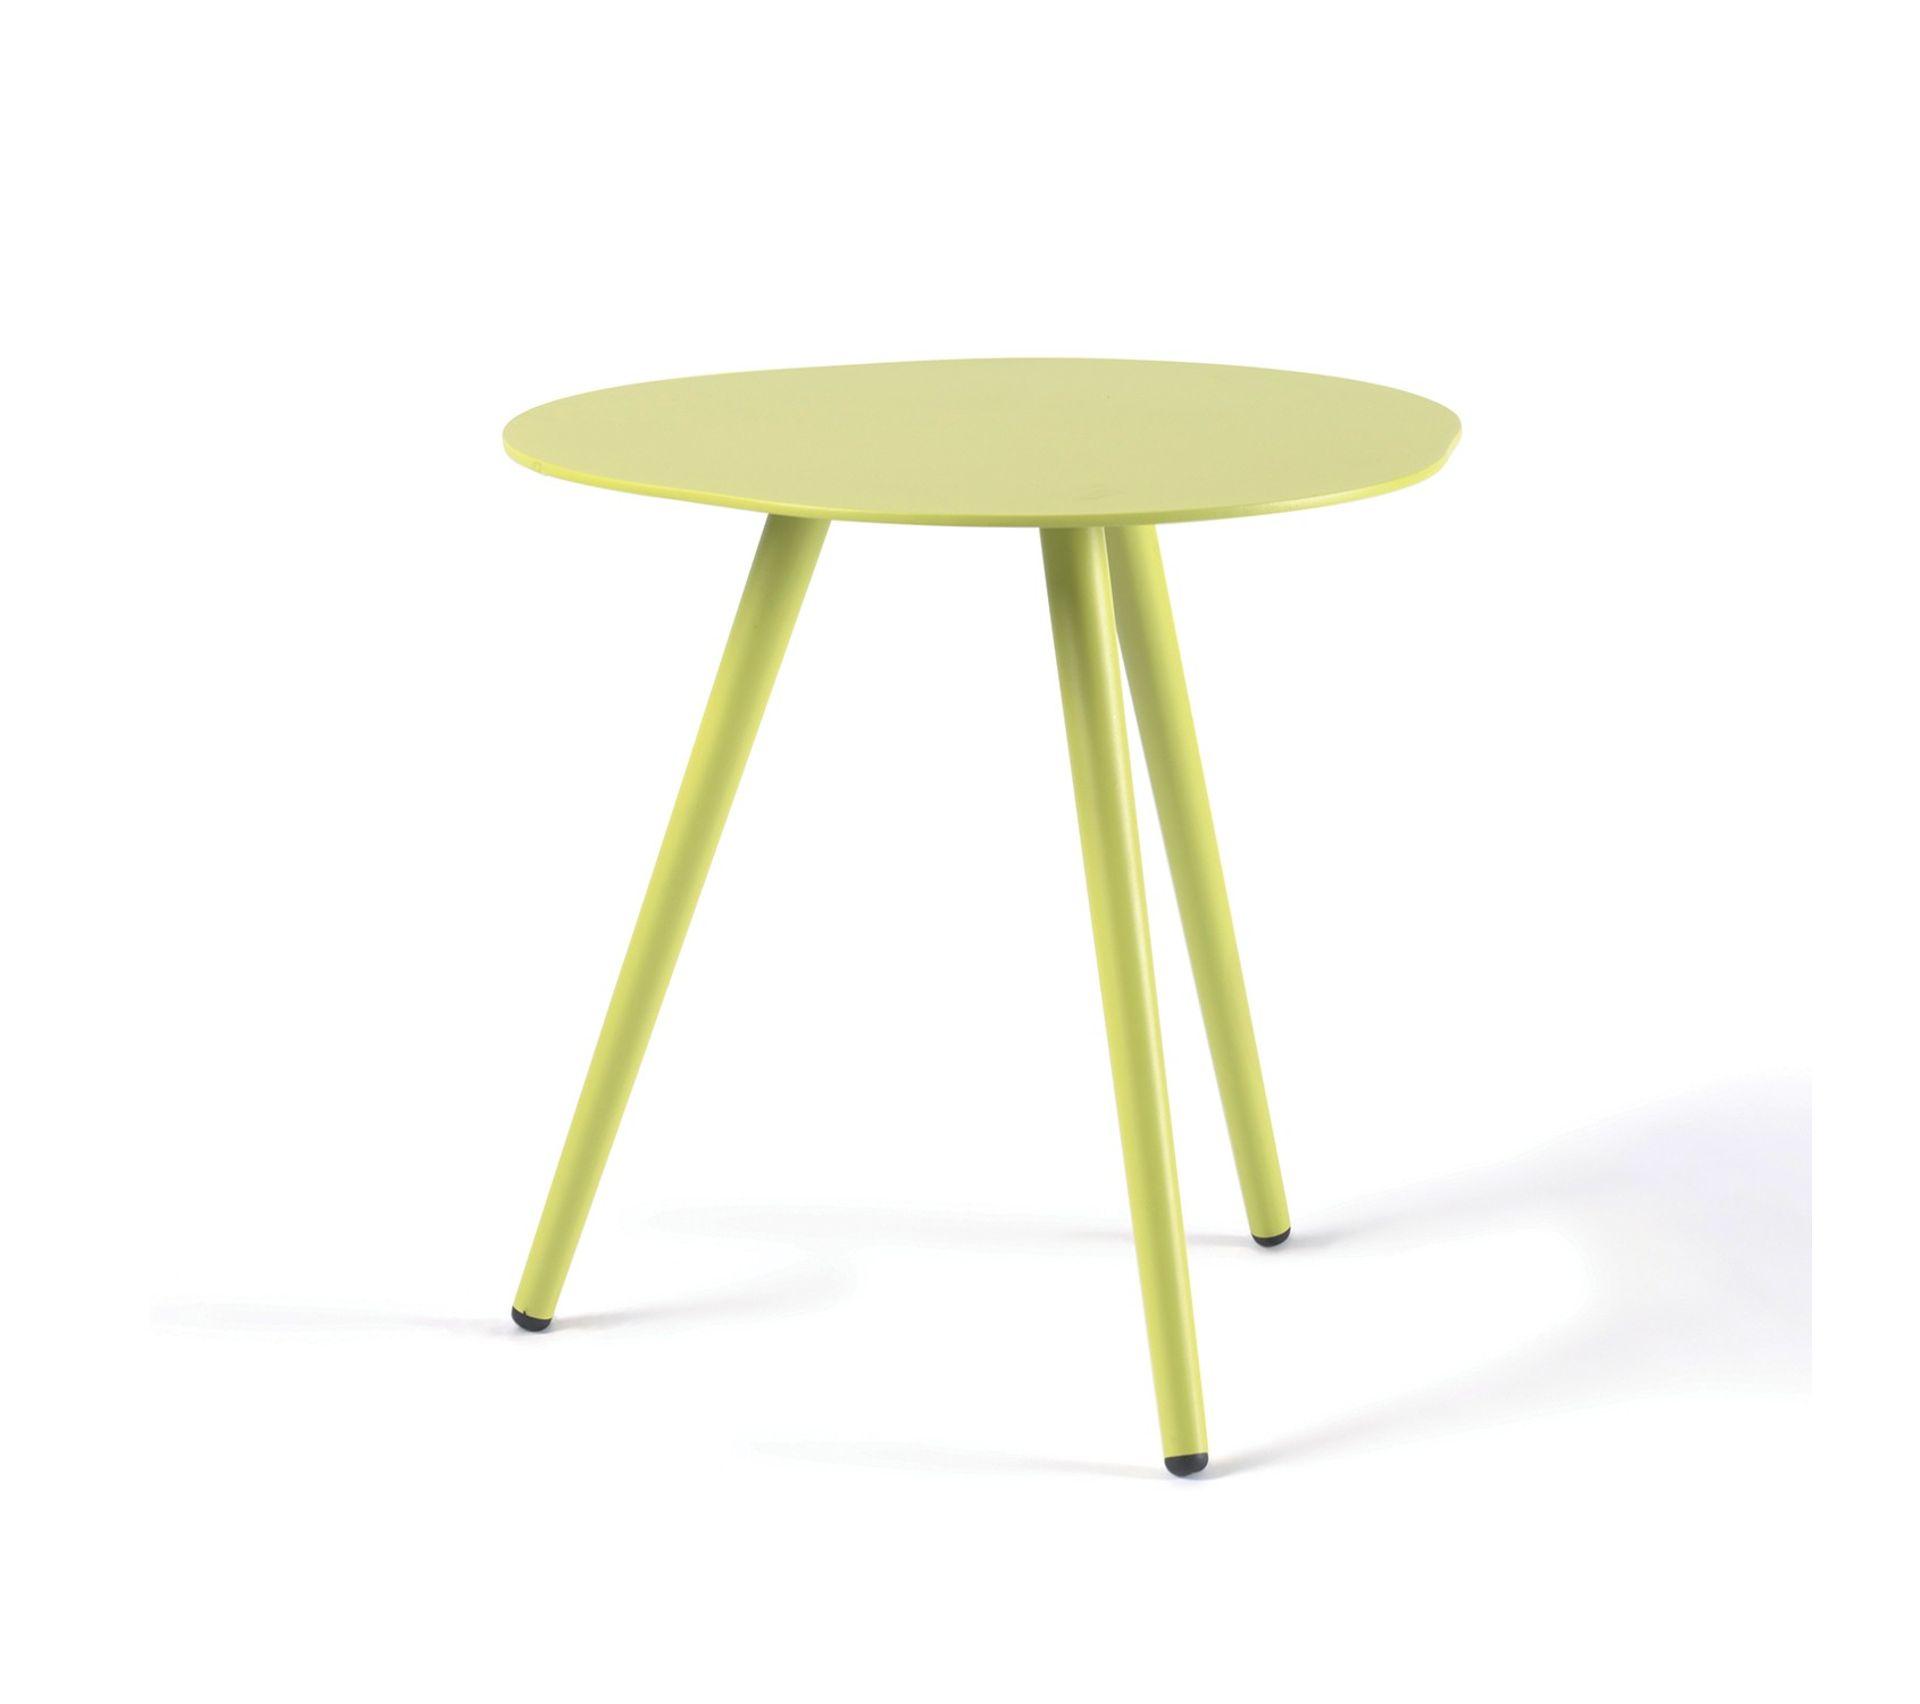 Meuble De Cuisine Vert Anis table dappoint en alu vert anis spezia